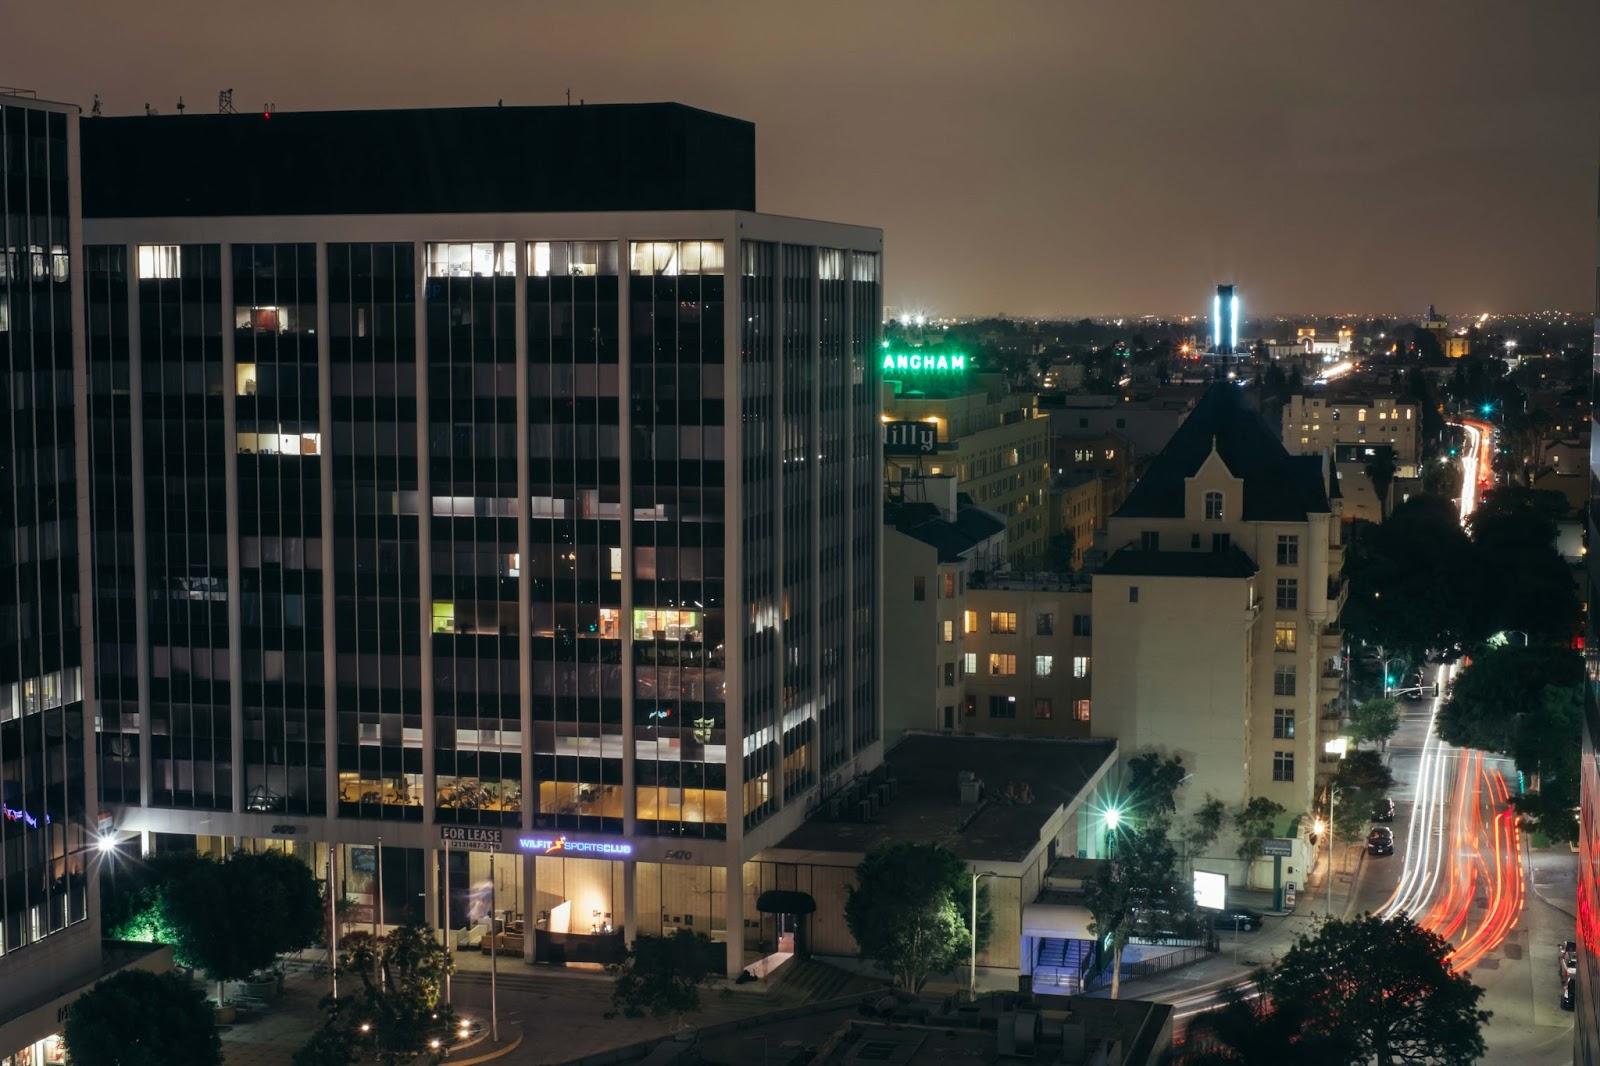 mybelonging-thelinehotel-losangeles-koreatown-hoteltonight-htinsider-32.jpg